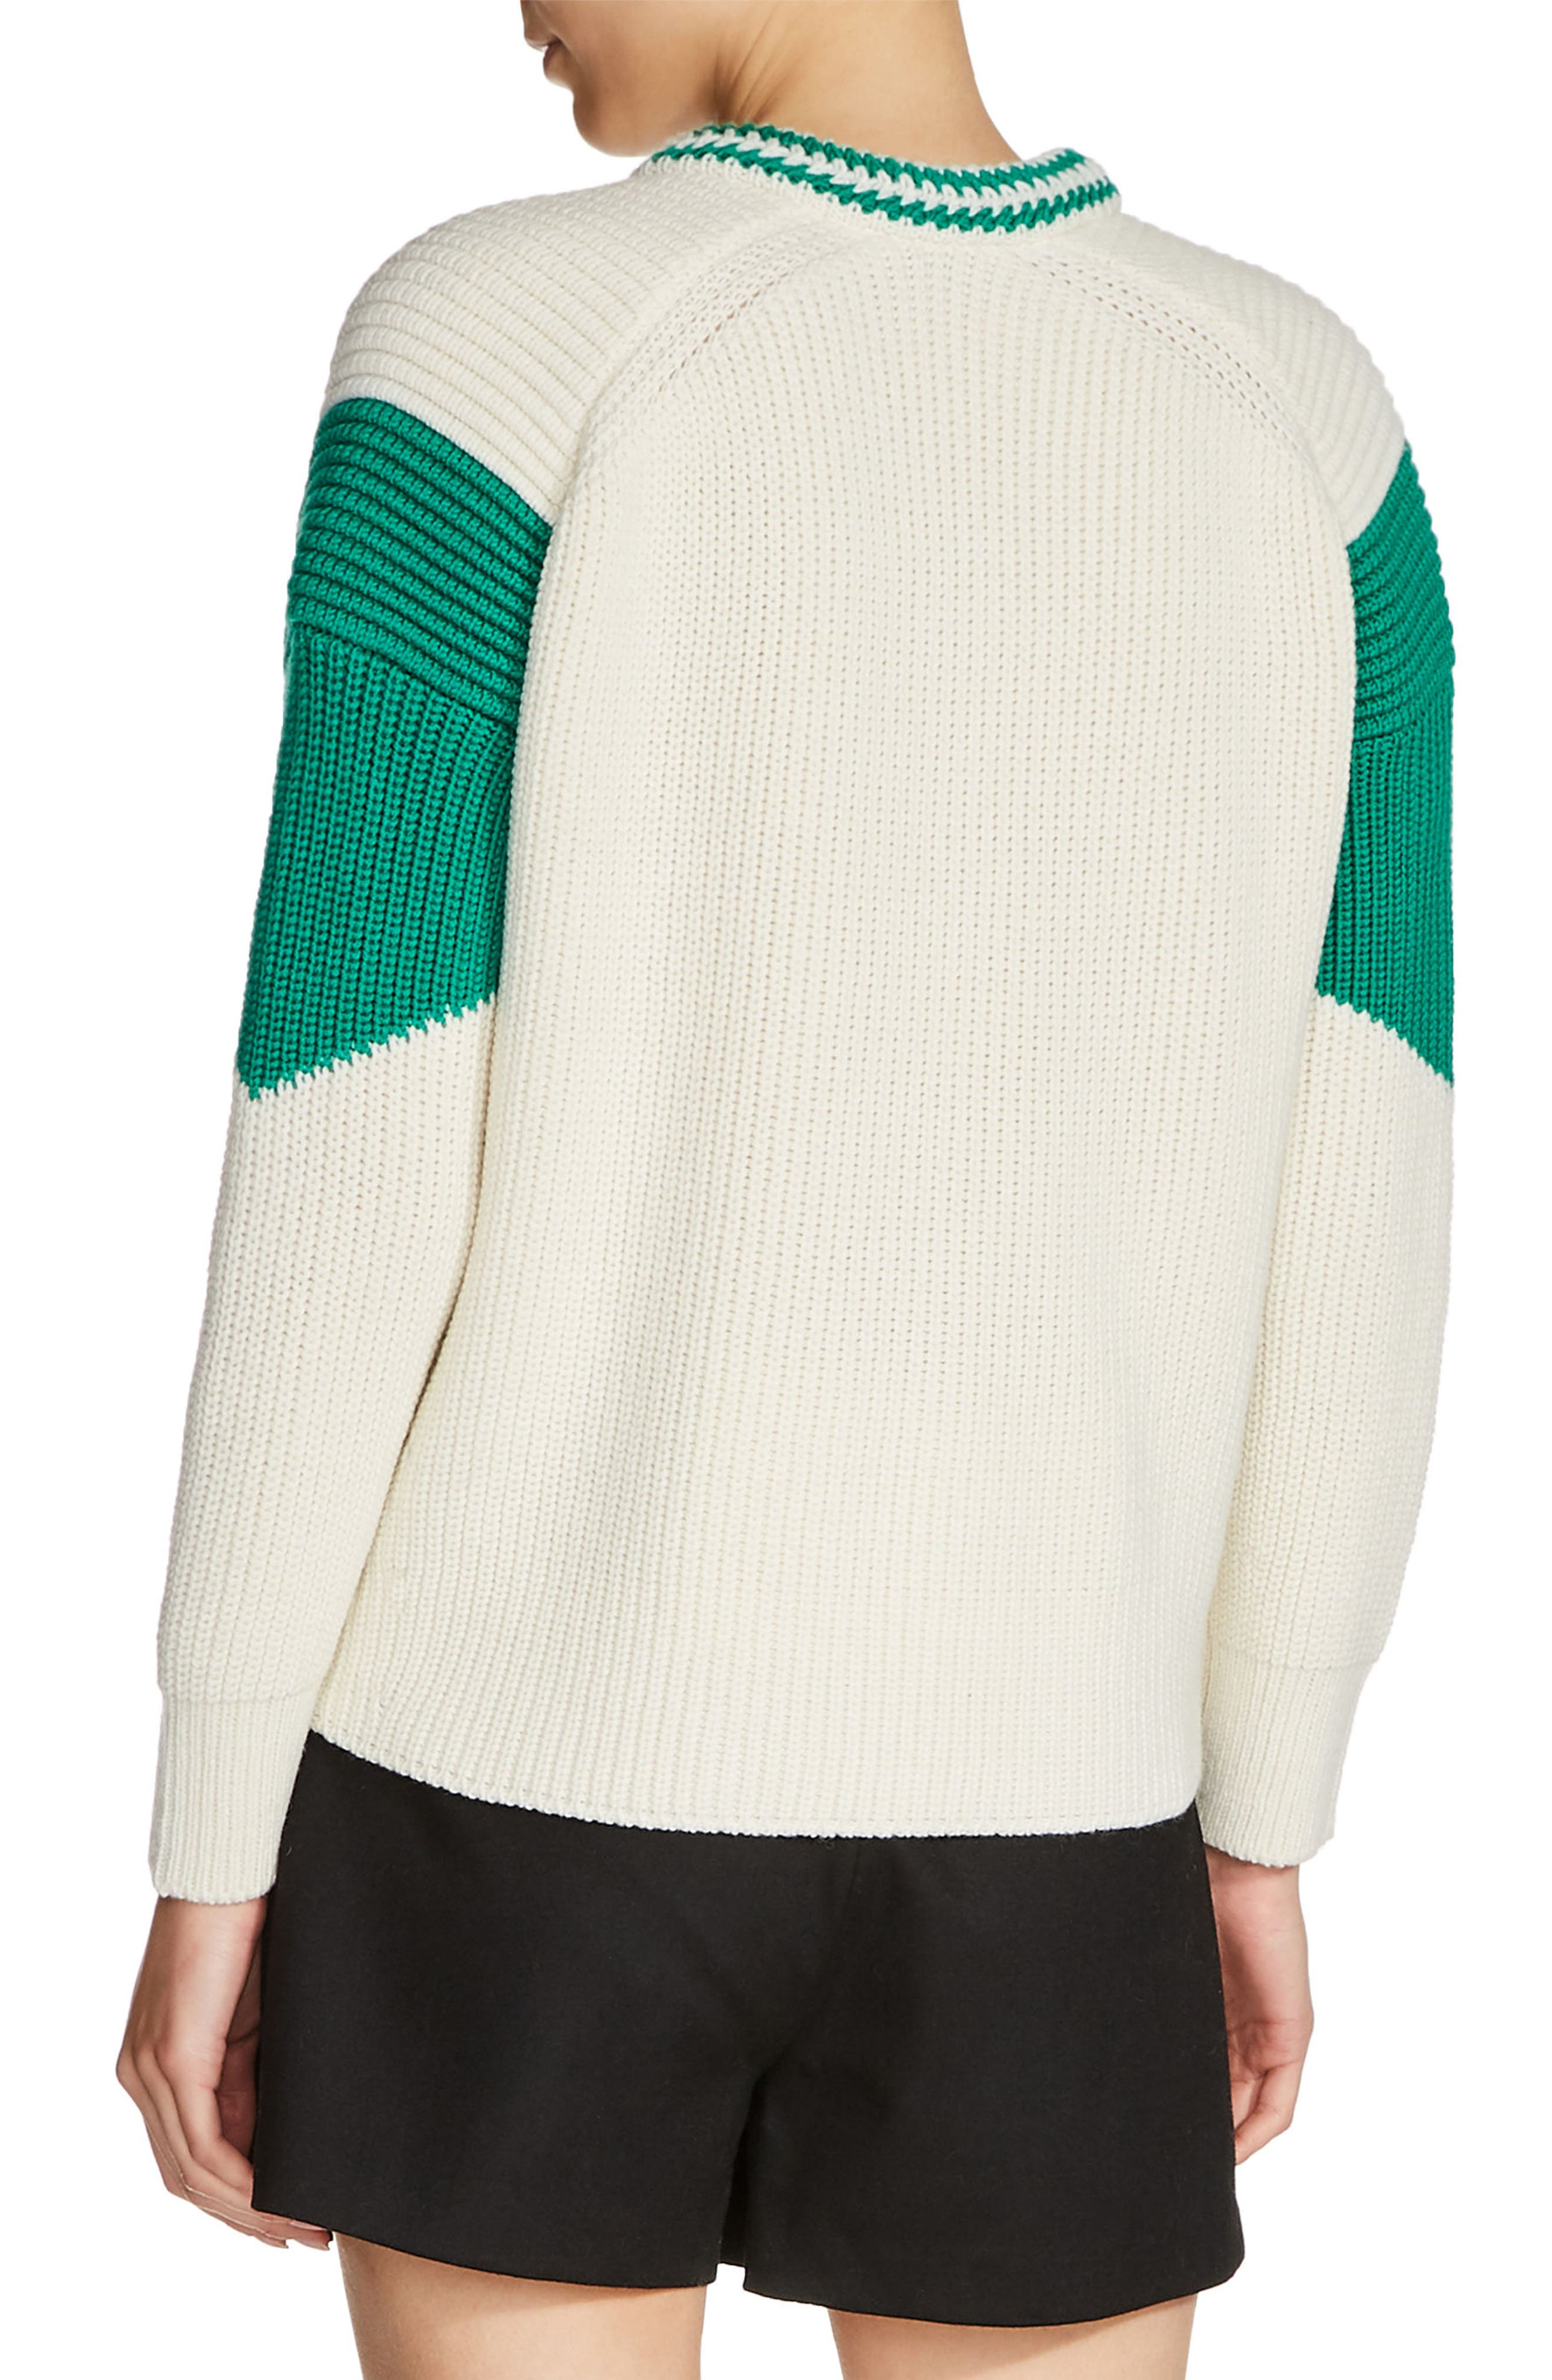 Snap Shoulder Sweater,                             Alternate thumbnail 2, color,                             301